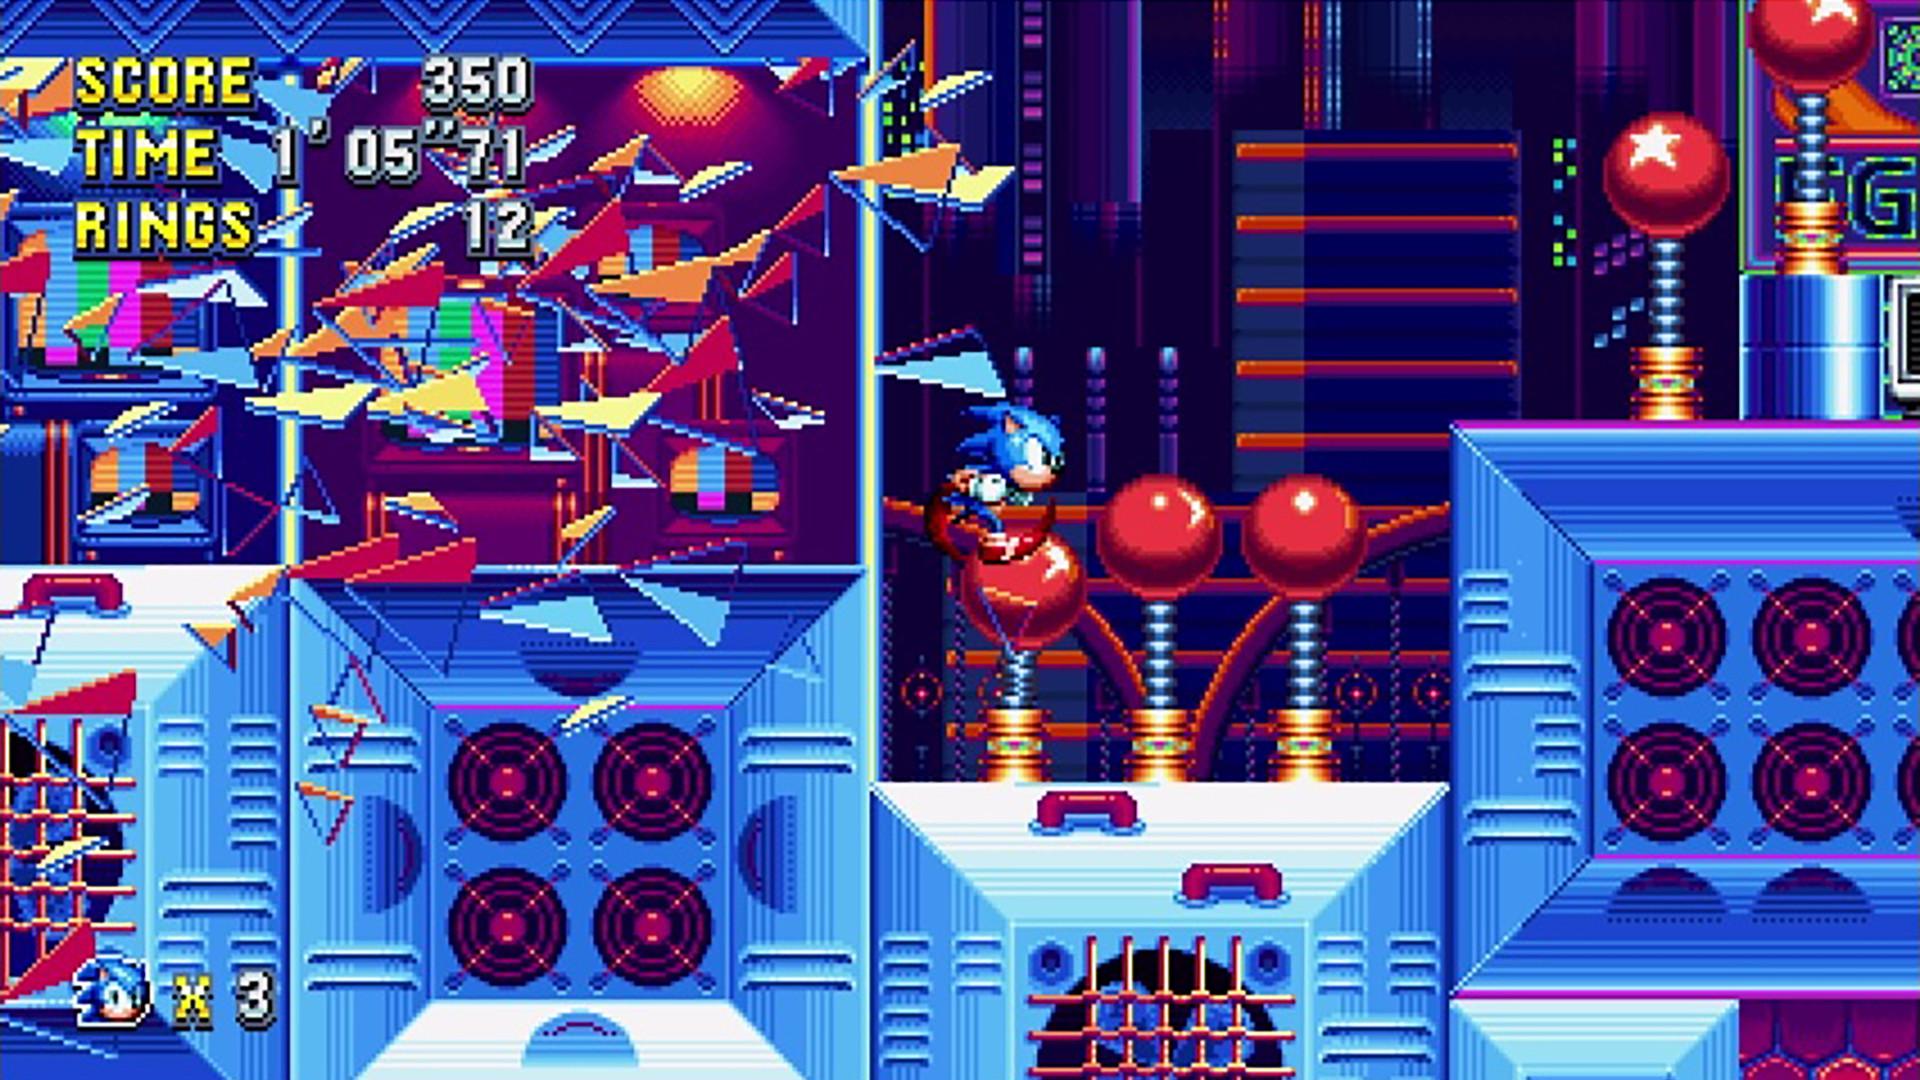 Sonic Mania image 2